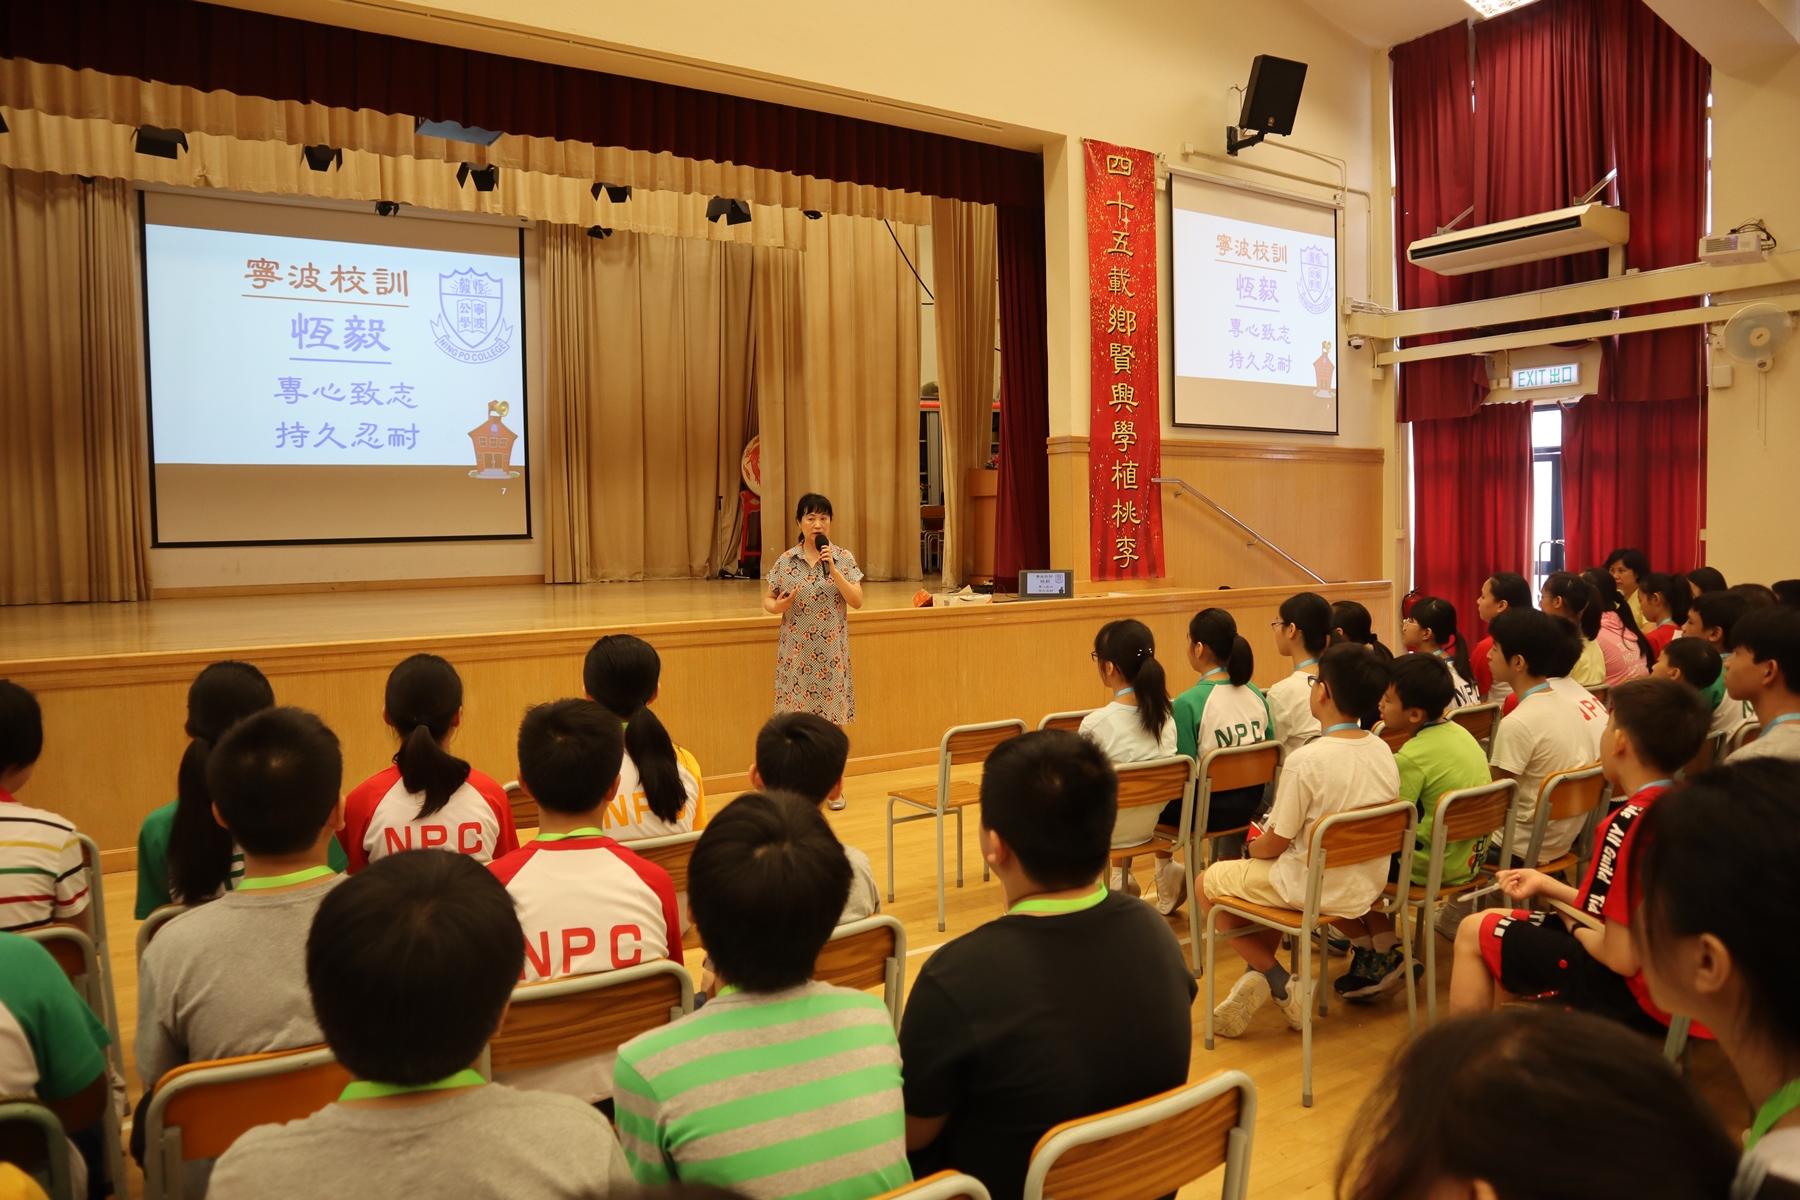 http://npc.edu.hk/sites/default/files/img_9204_3.jpg